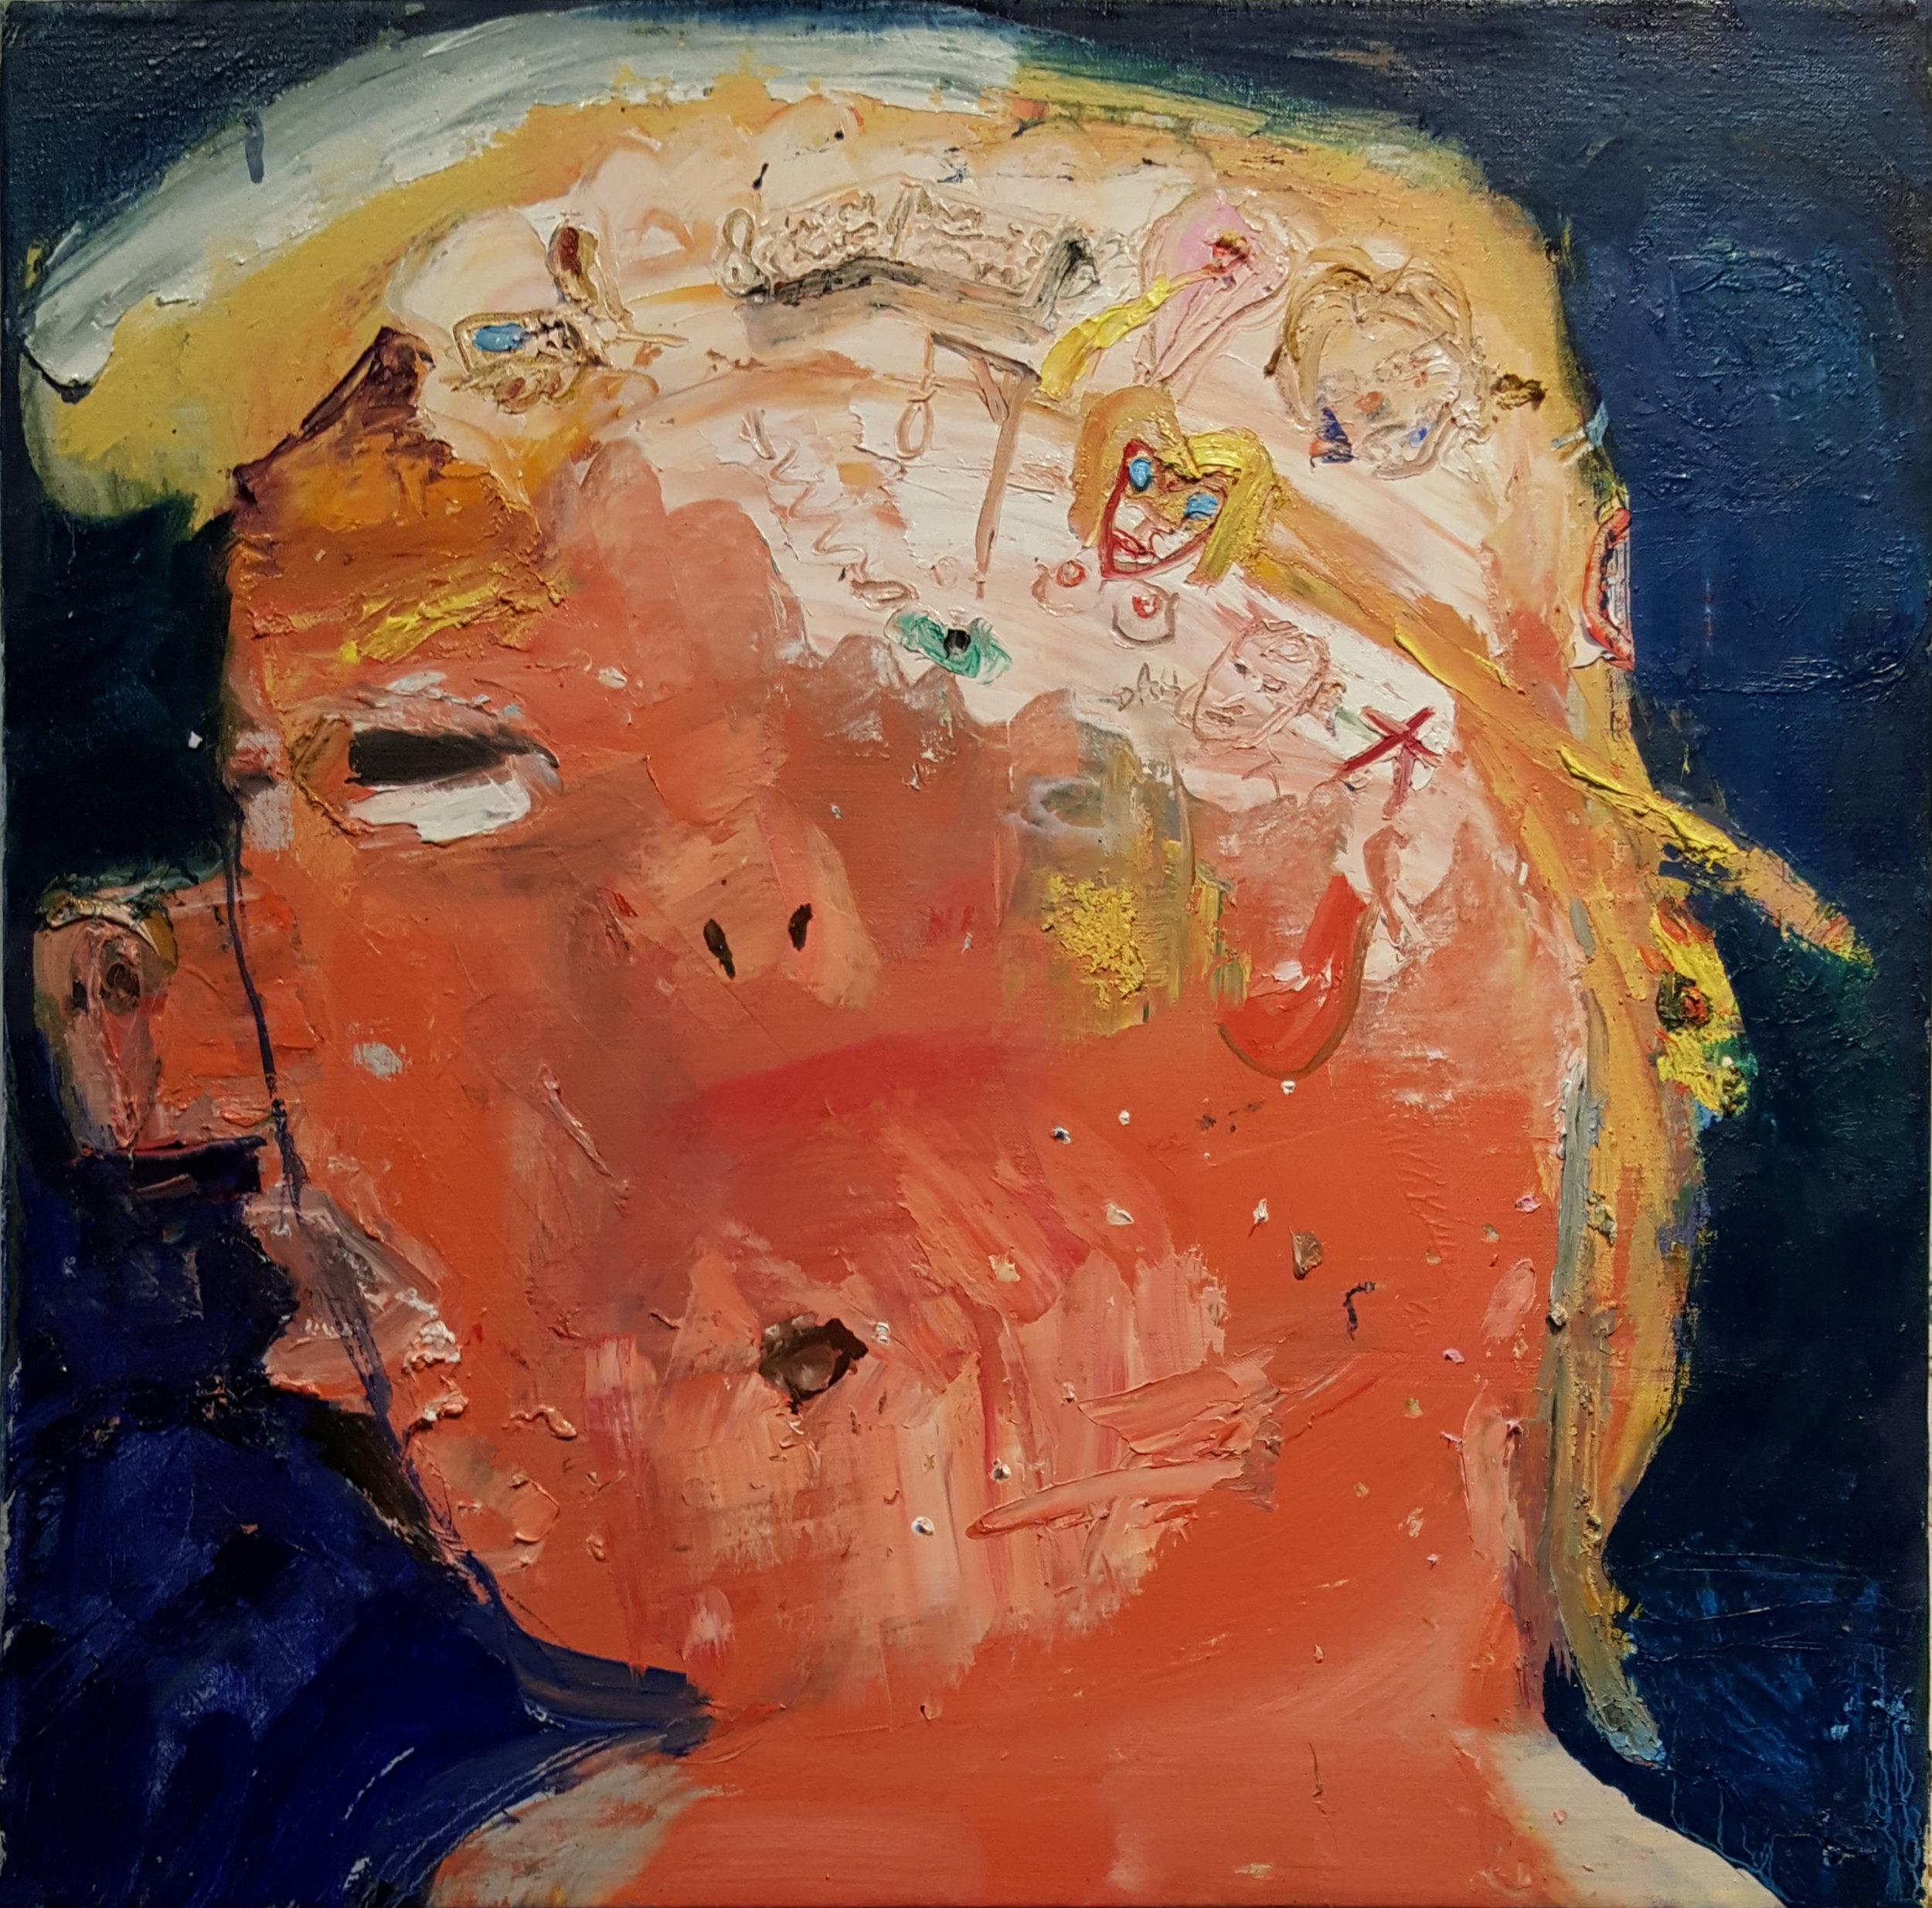 Matt Blackwell,  Internal Life (portrait of Donald Trump),  2017, oil on linen, 18h x 18w in.